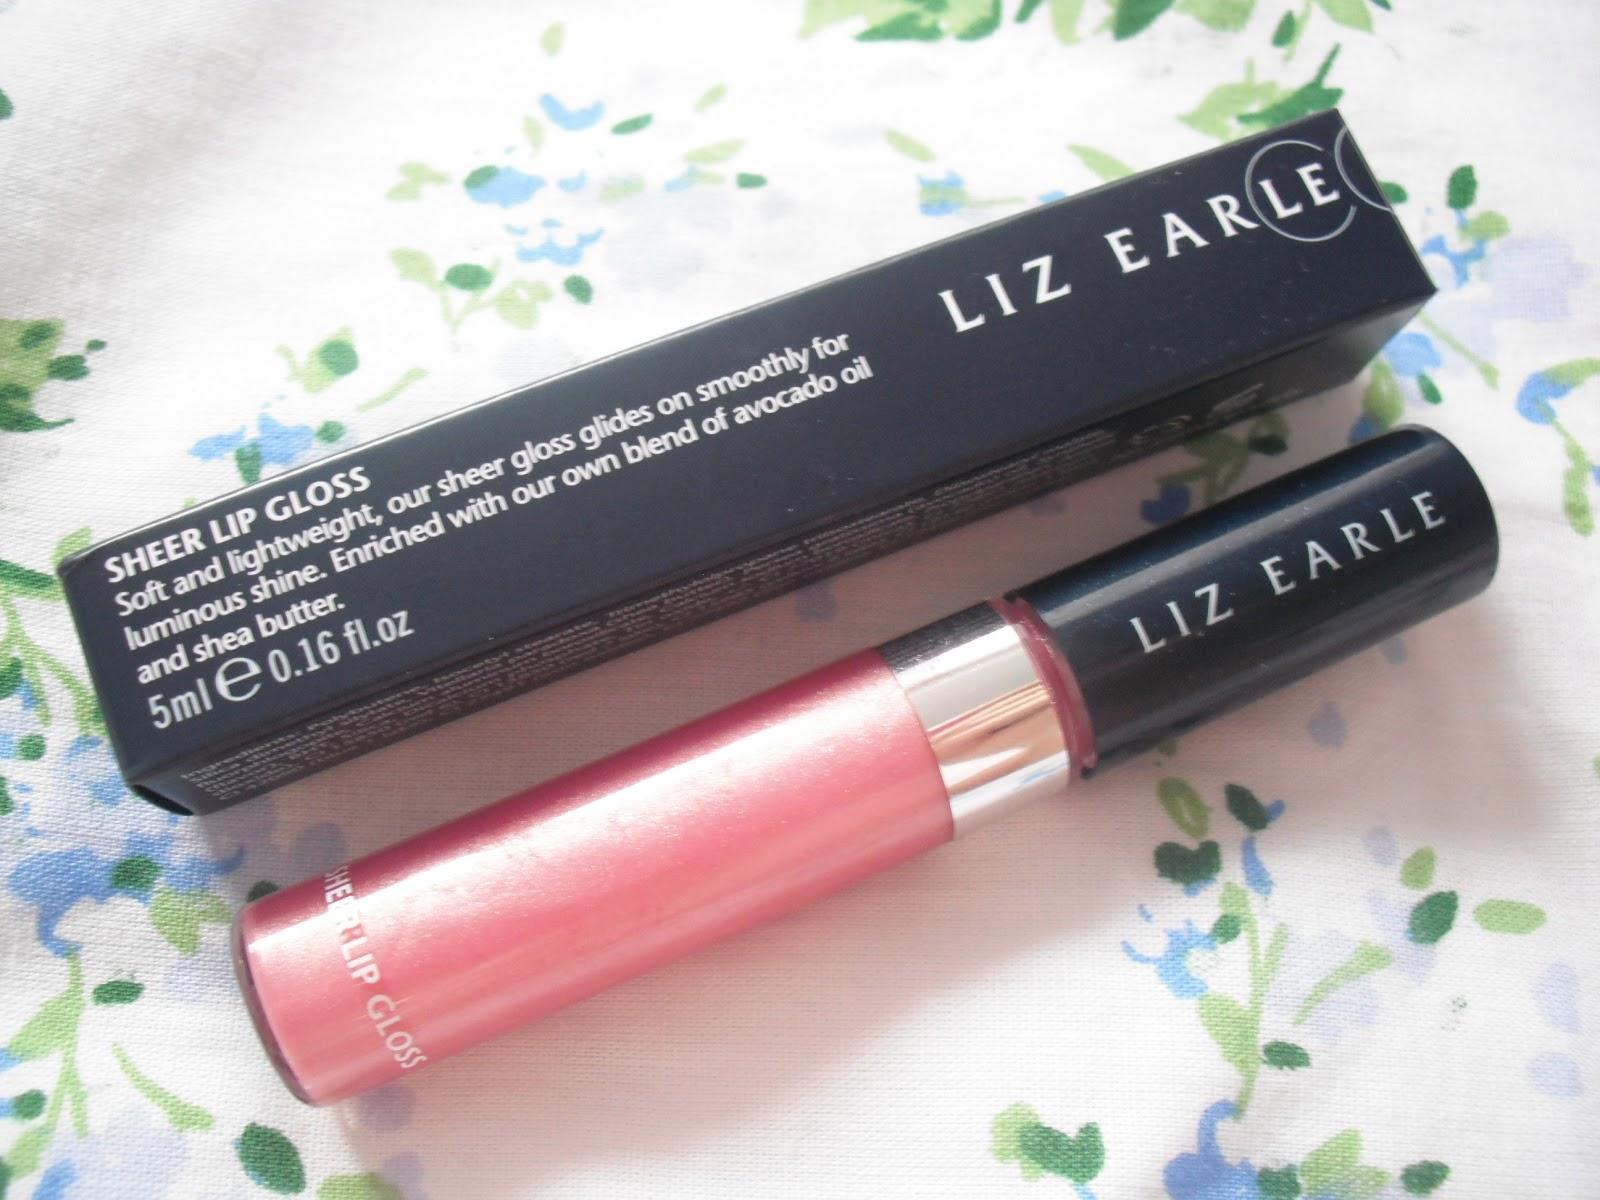 Liz earle lipstick